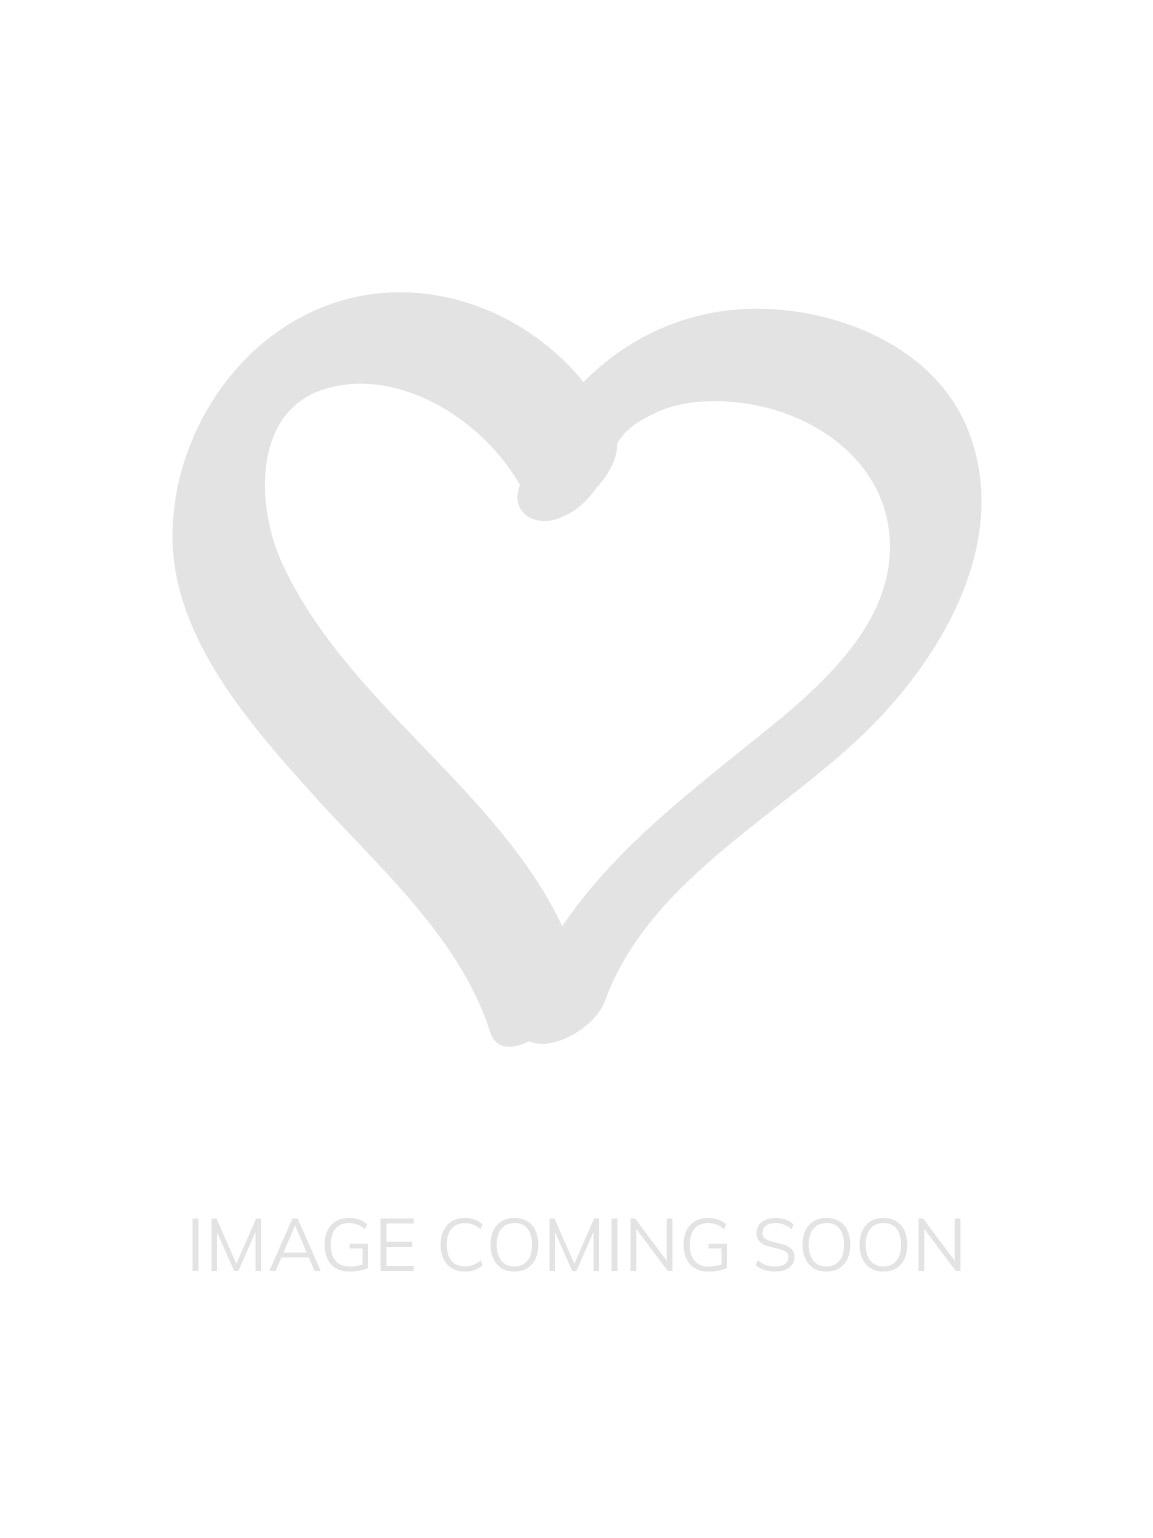 5bfd81a2628 Embrace Lace T Shirt Bra - Black